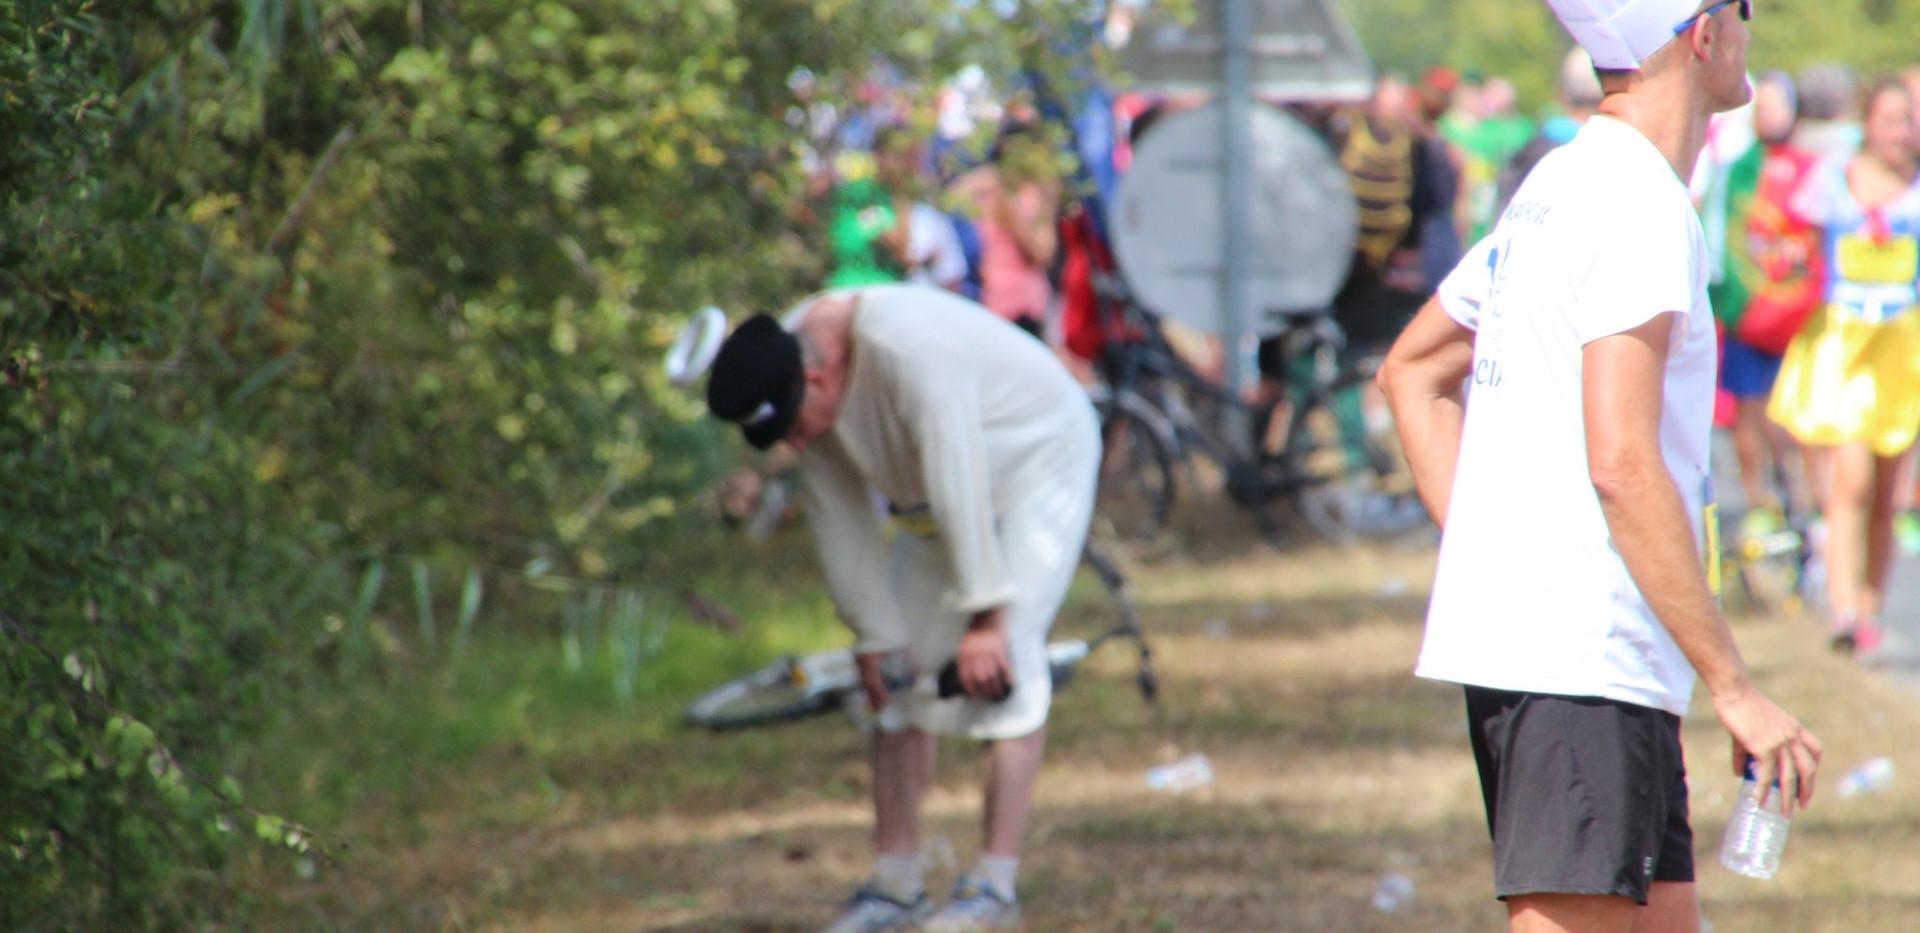 Inebriated Marathon Runner